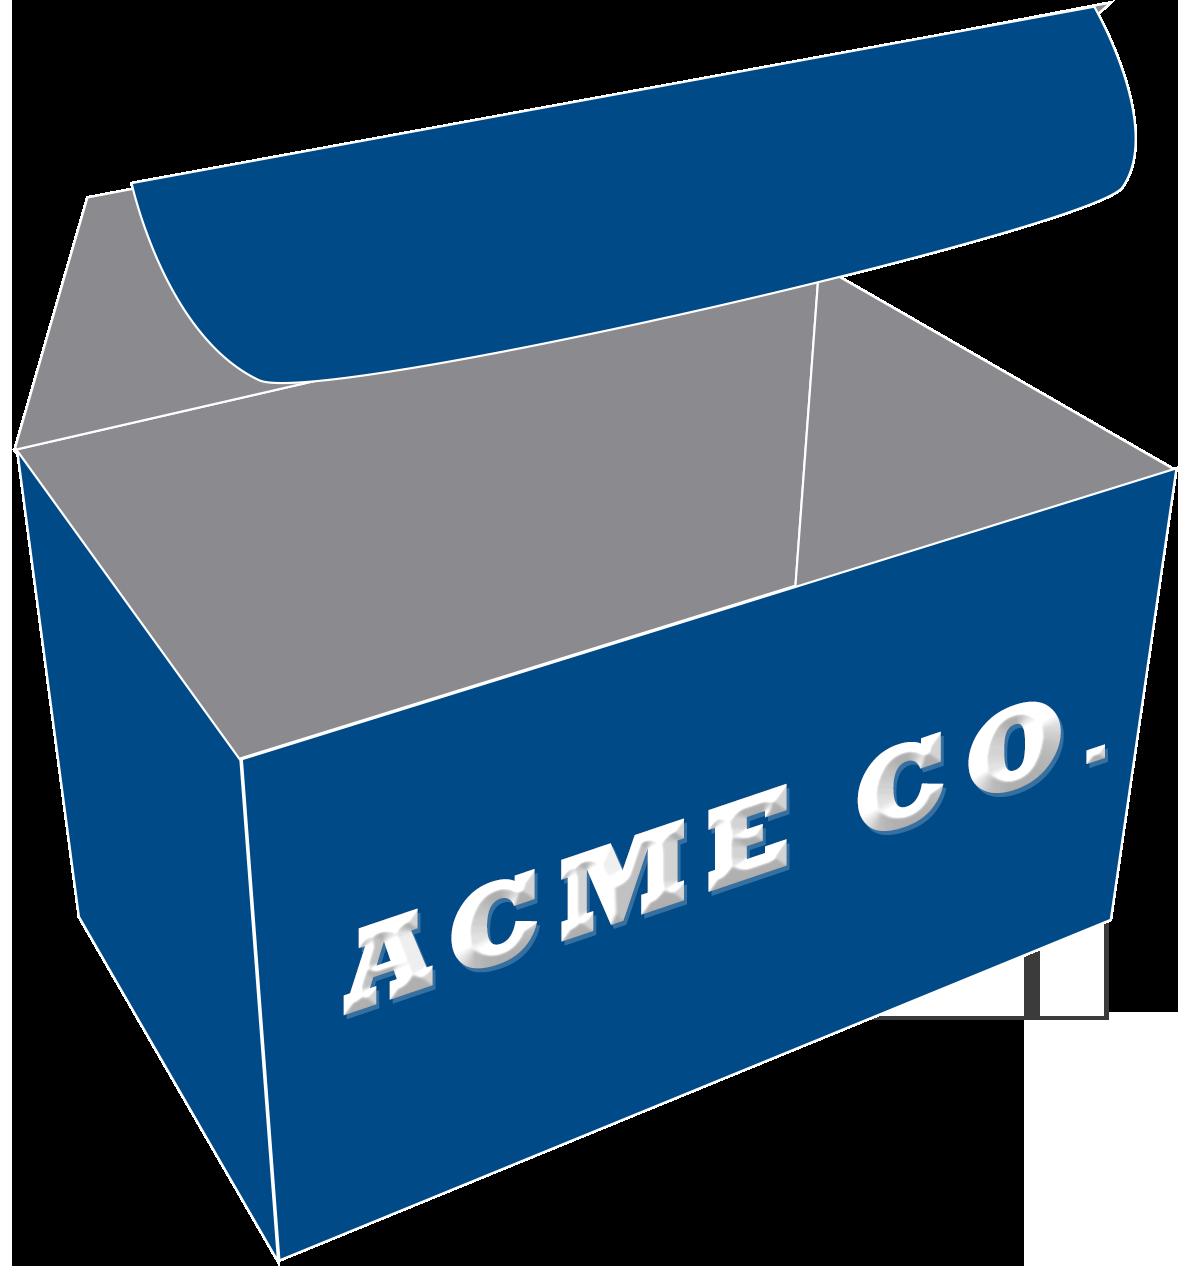 Custom box printing - add names, logos or graphics